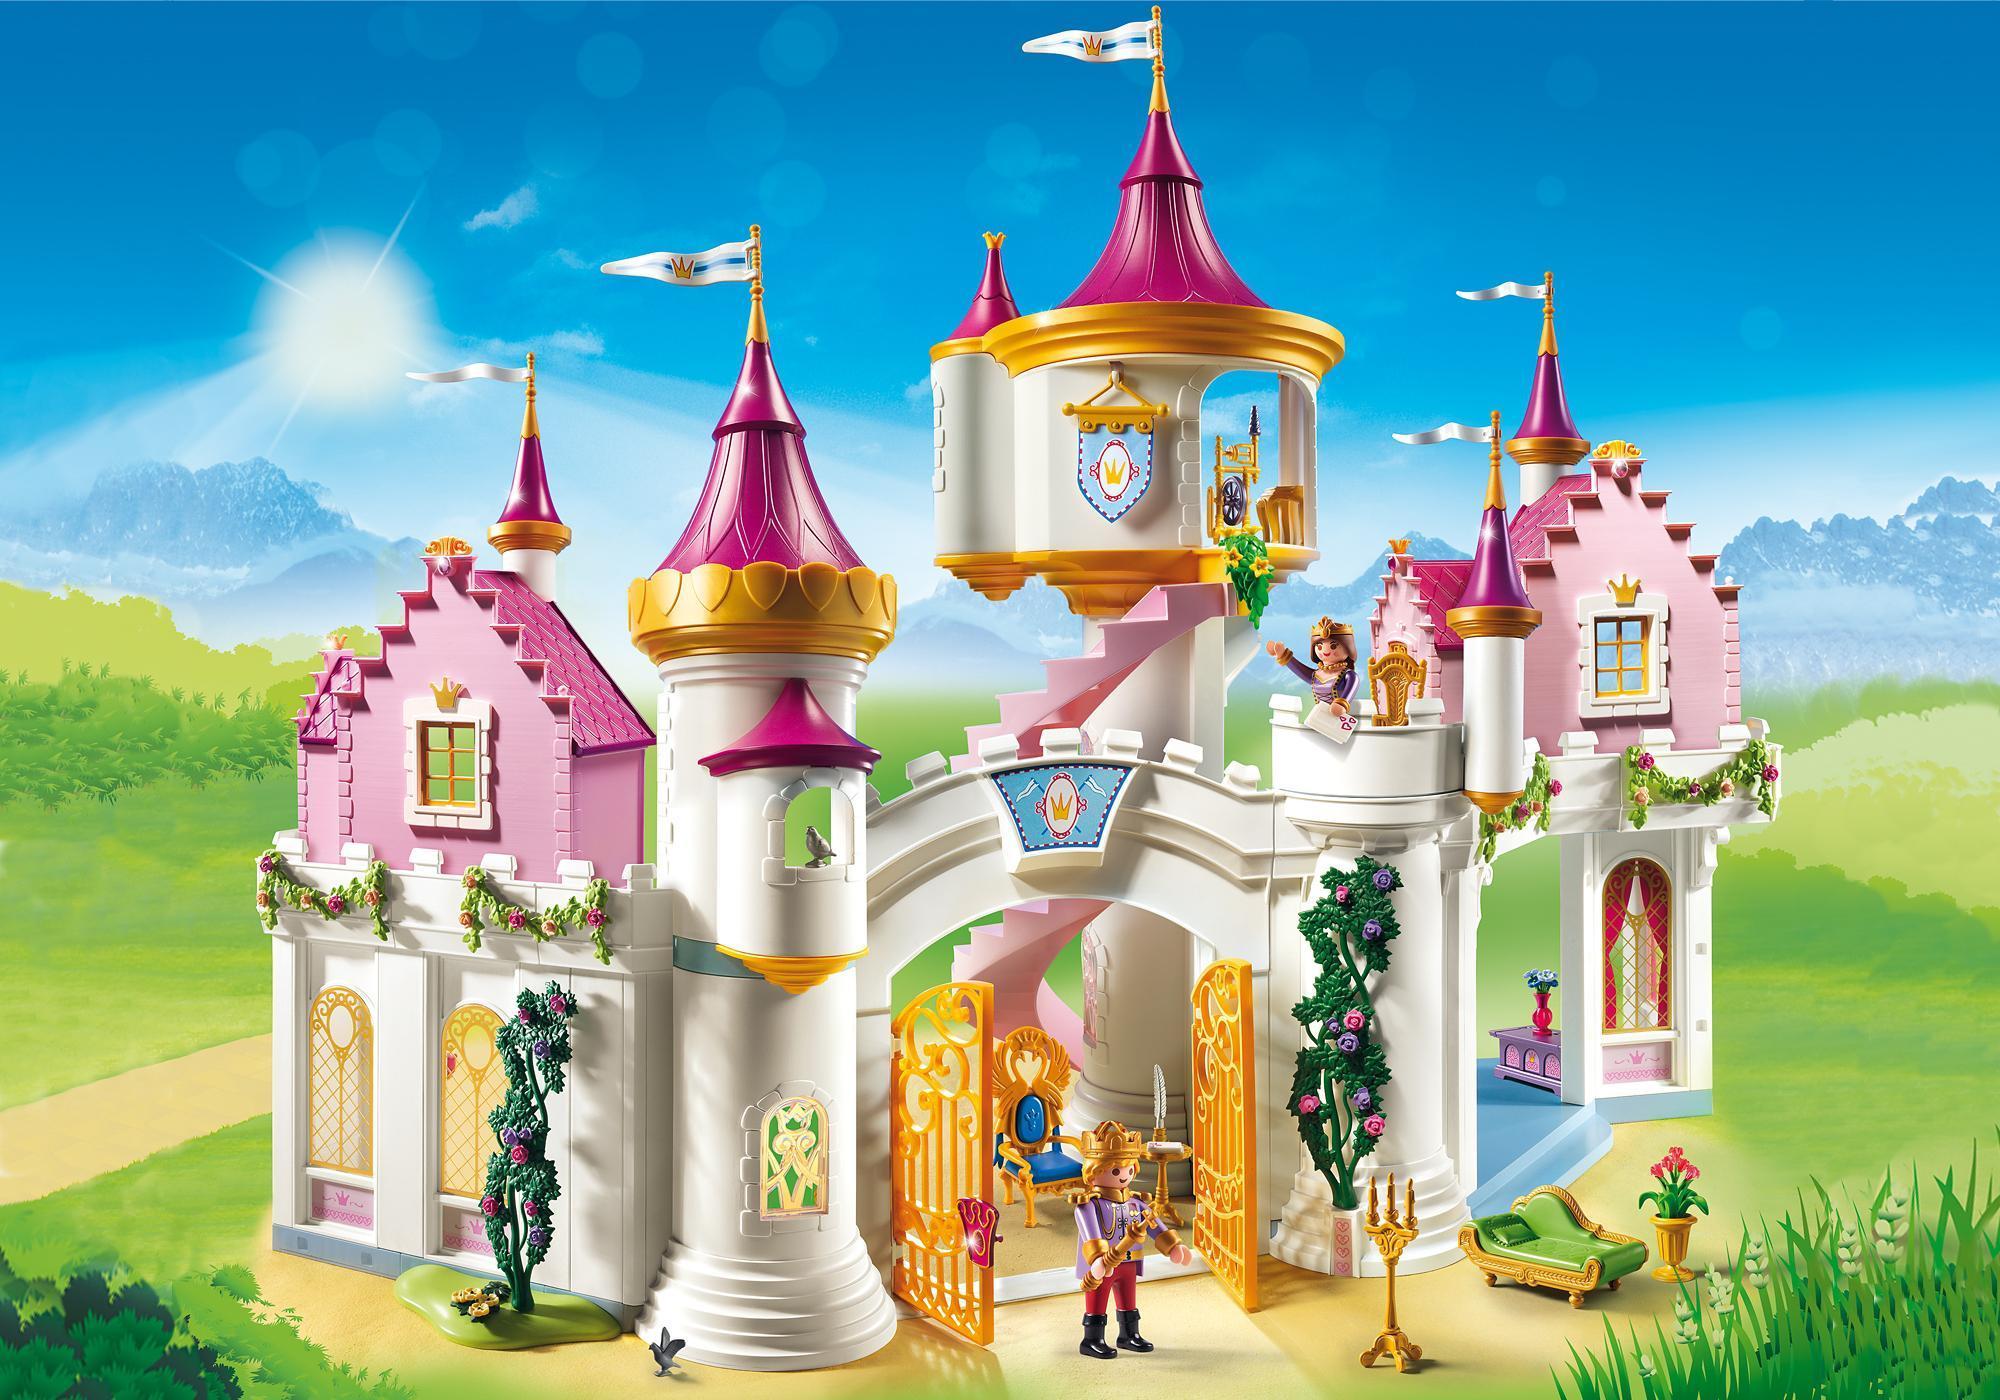 6848_product_detail/Замок Принцессы: Большой Замок Принцессы